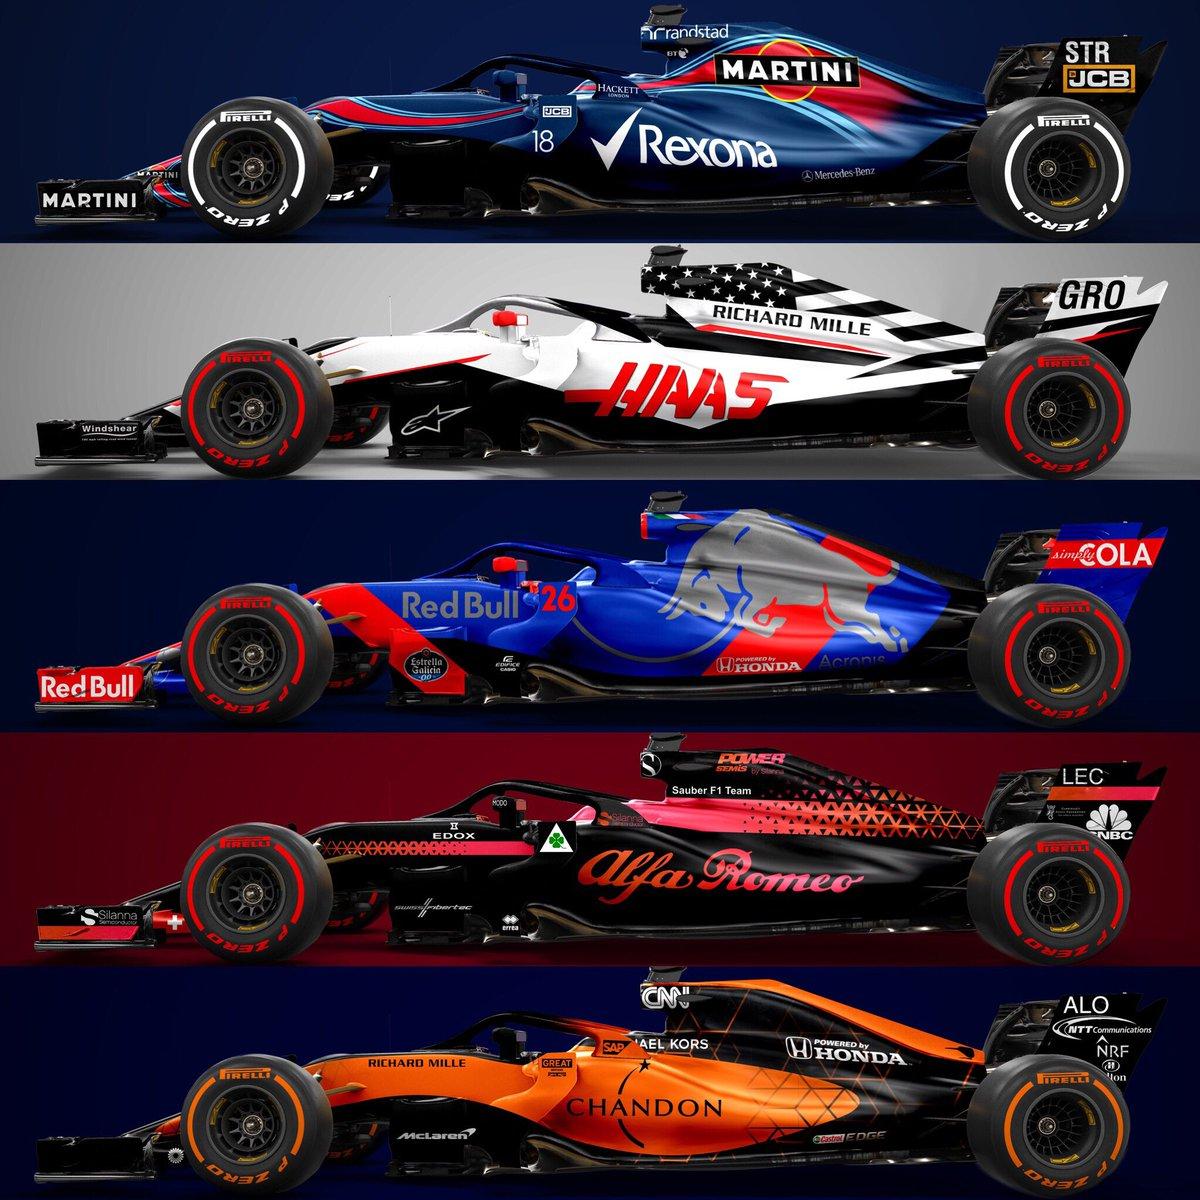 Red Bull Design | Sean Bull Design On Twitter 9 10 Designs Done So Far What S Your